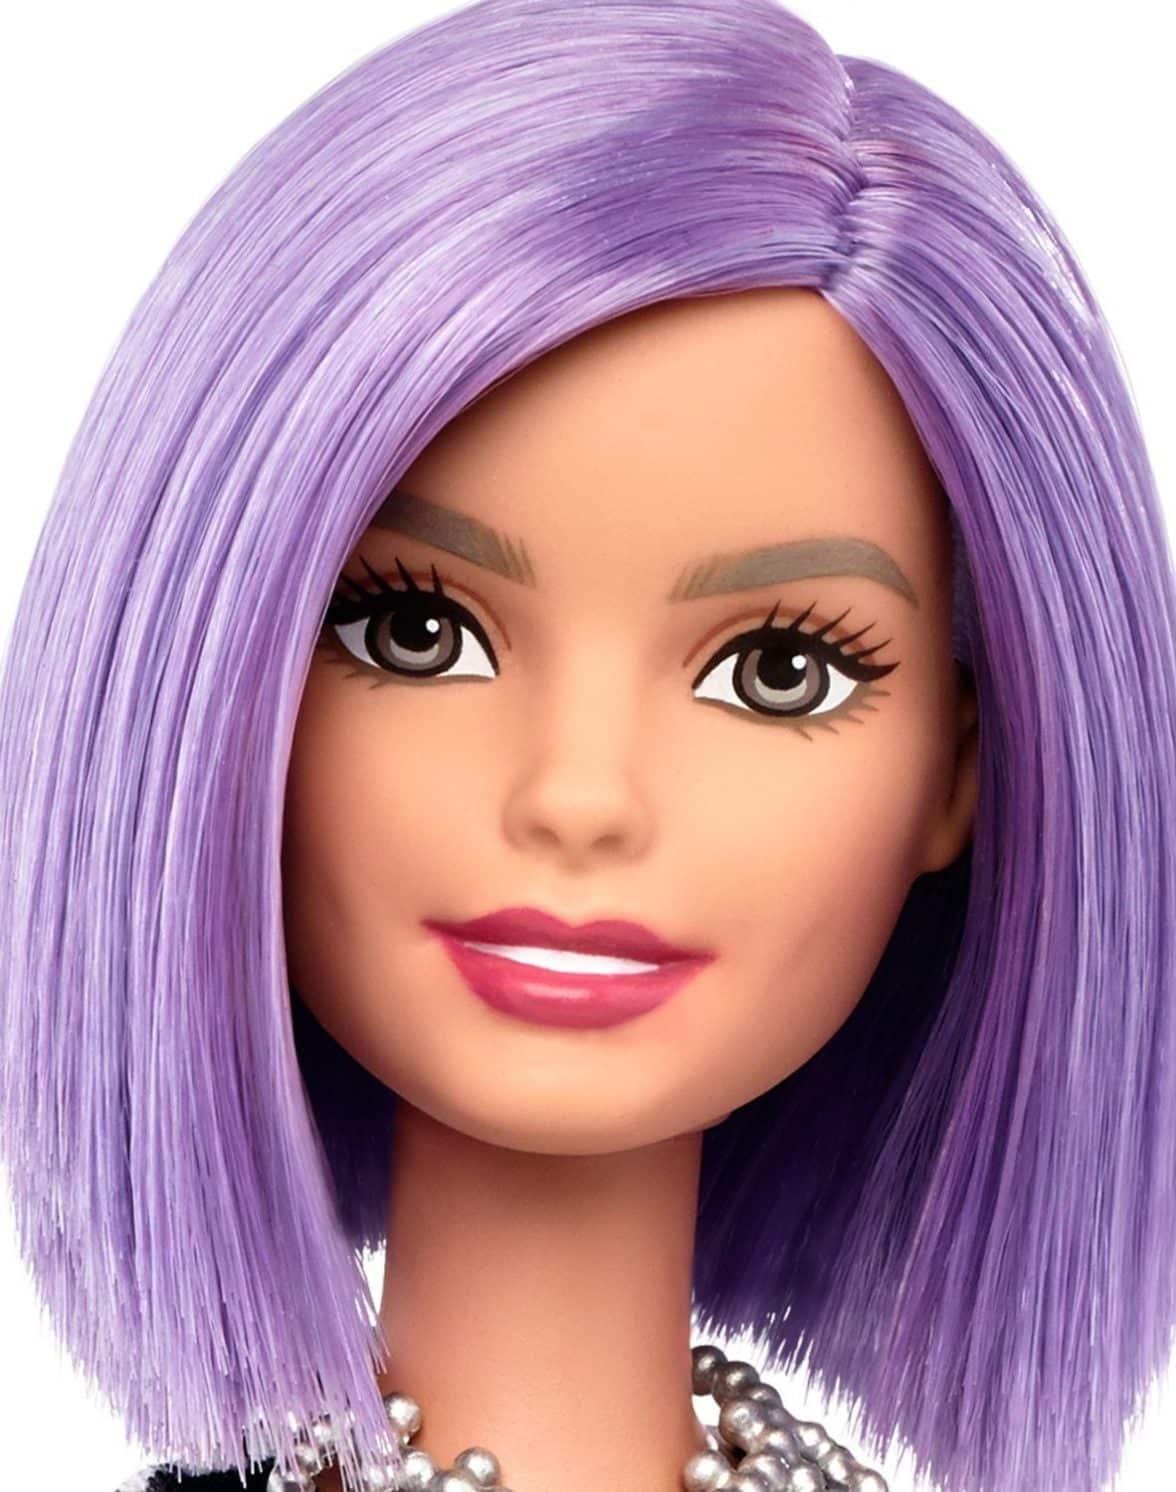 Barbie Fashionistas Doll with Purple Hair